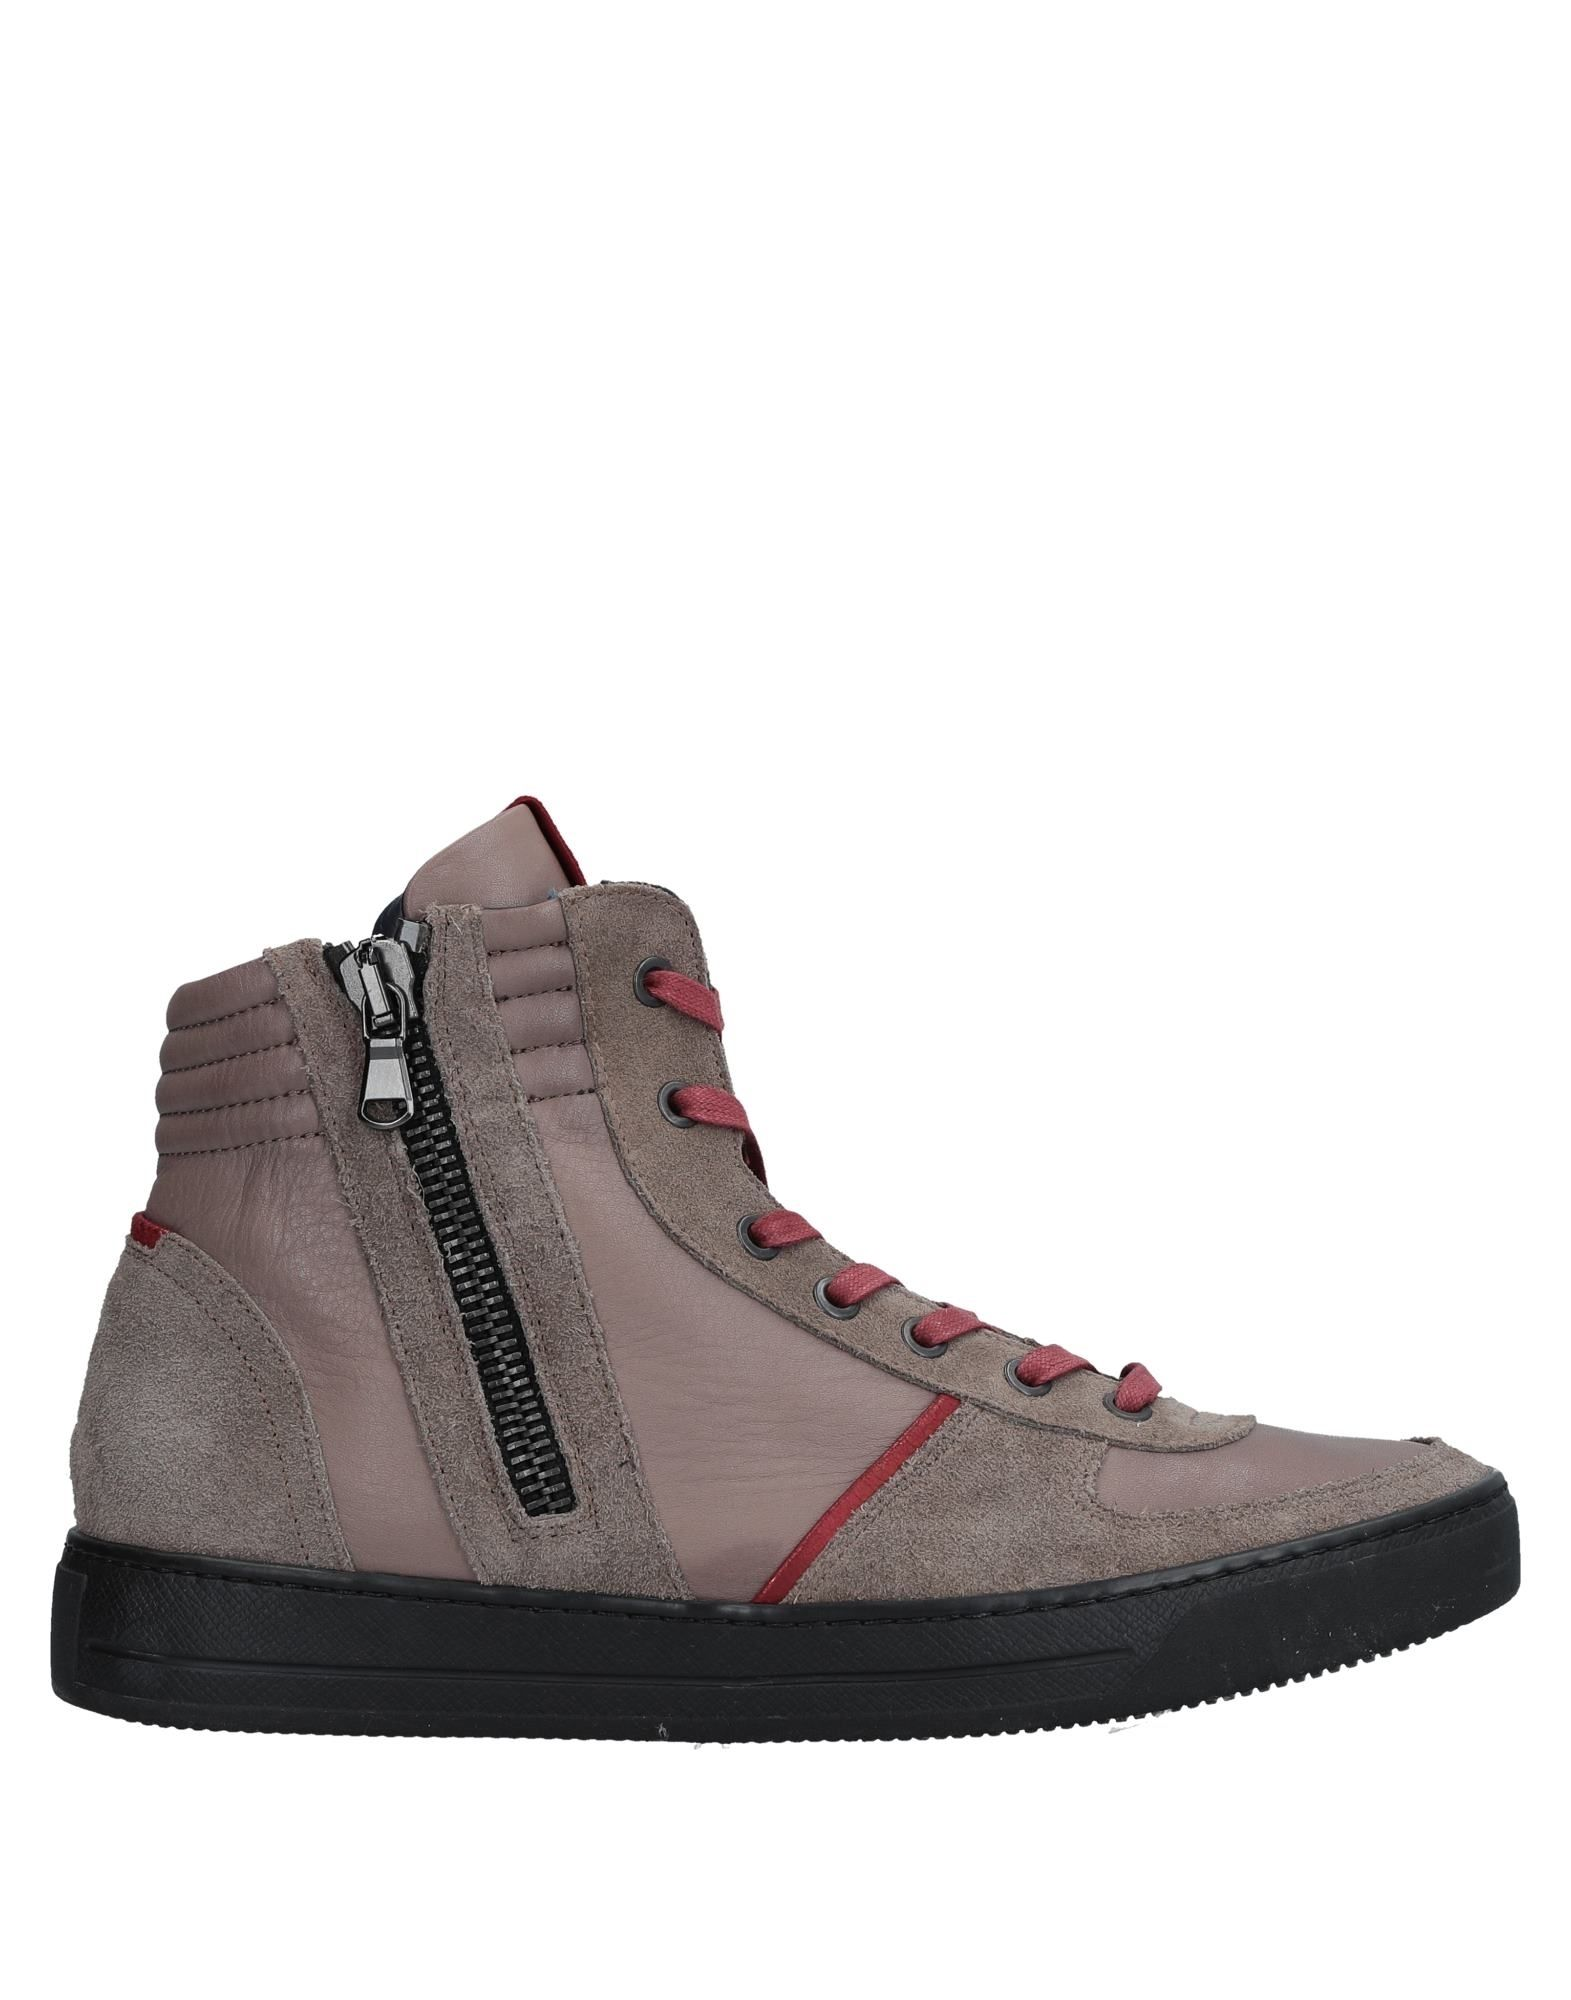 Lab. Pal Zileri Sneakers Herren  11543969FL Gute Qualität beliebte Schuhe